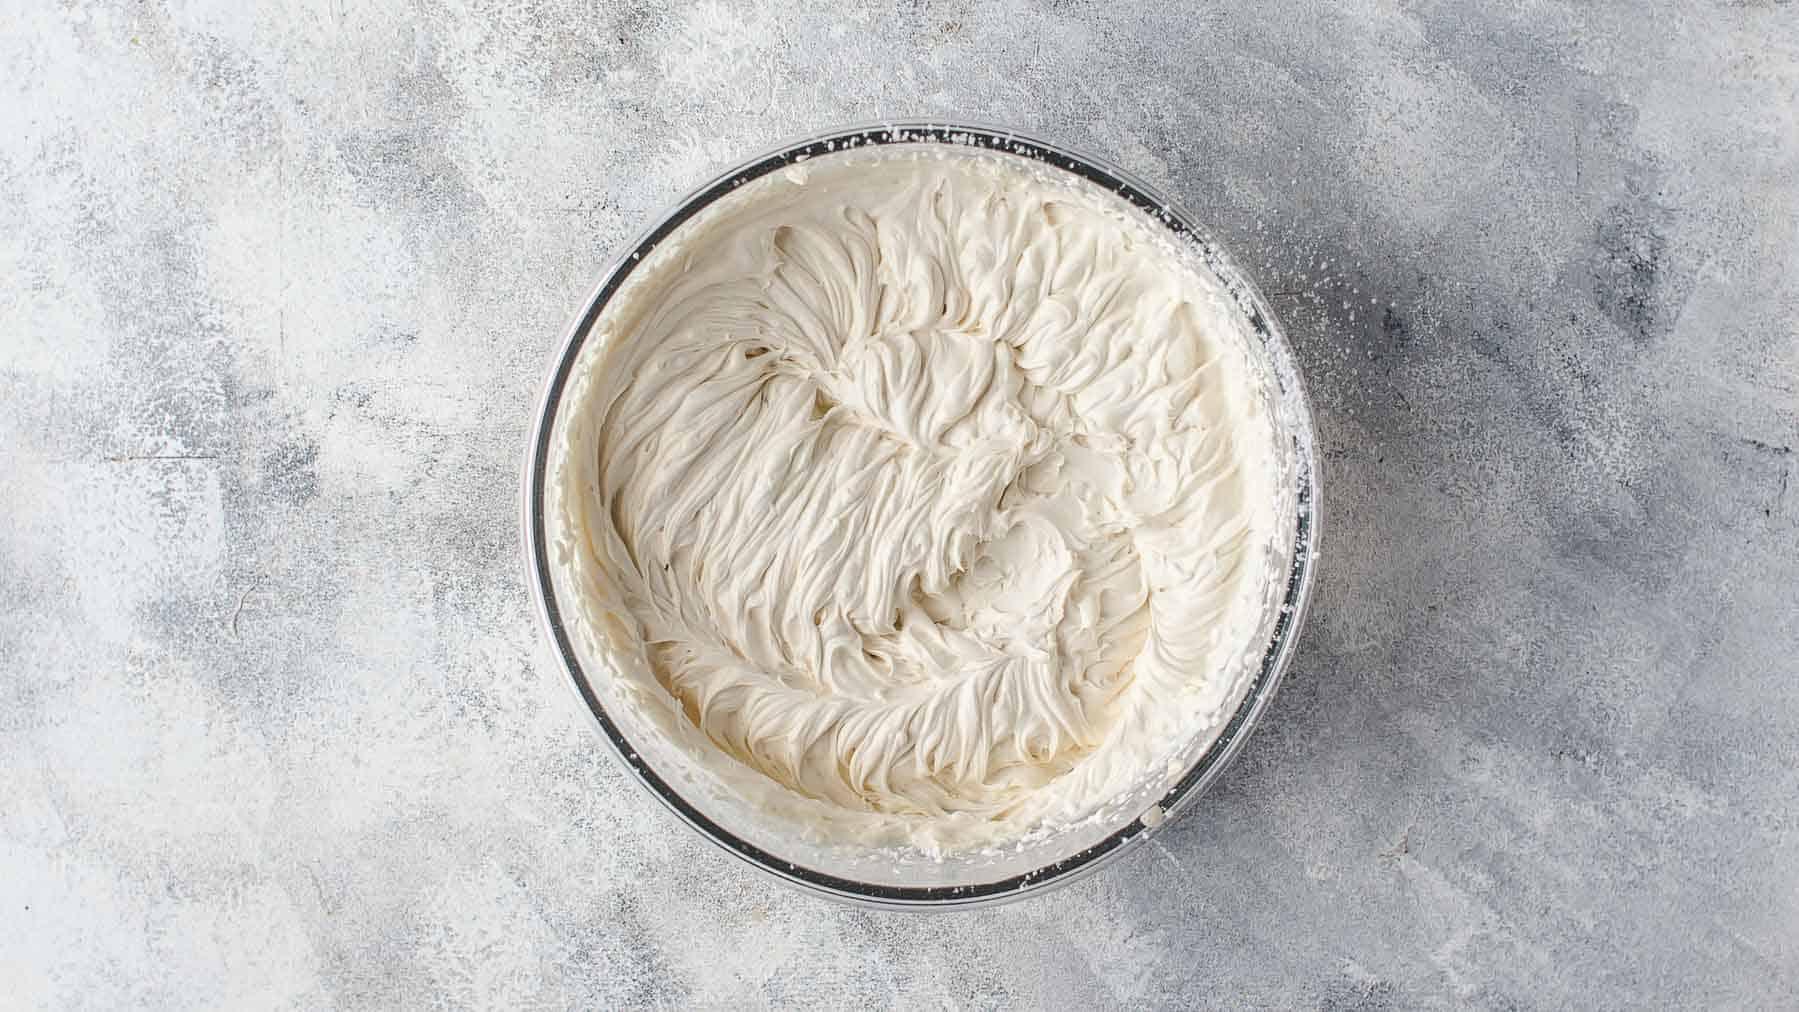 Mixed mascarpone cream